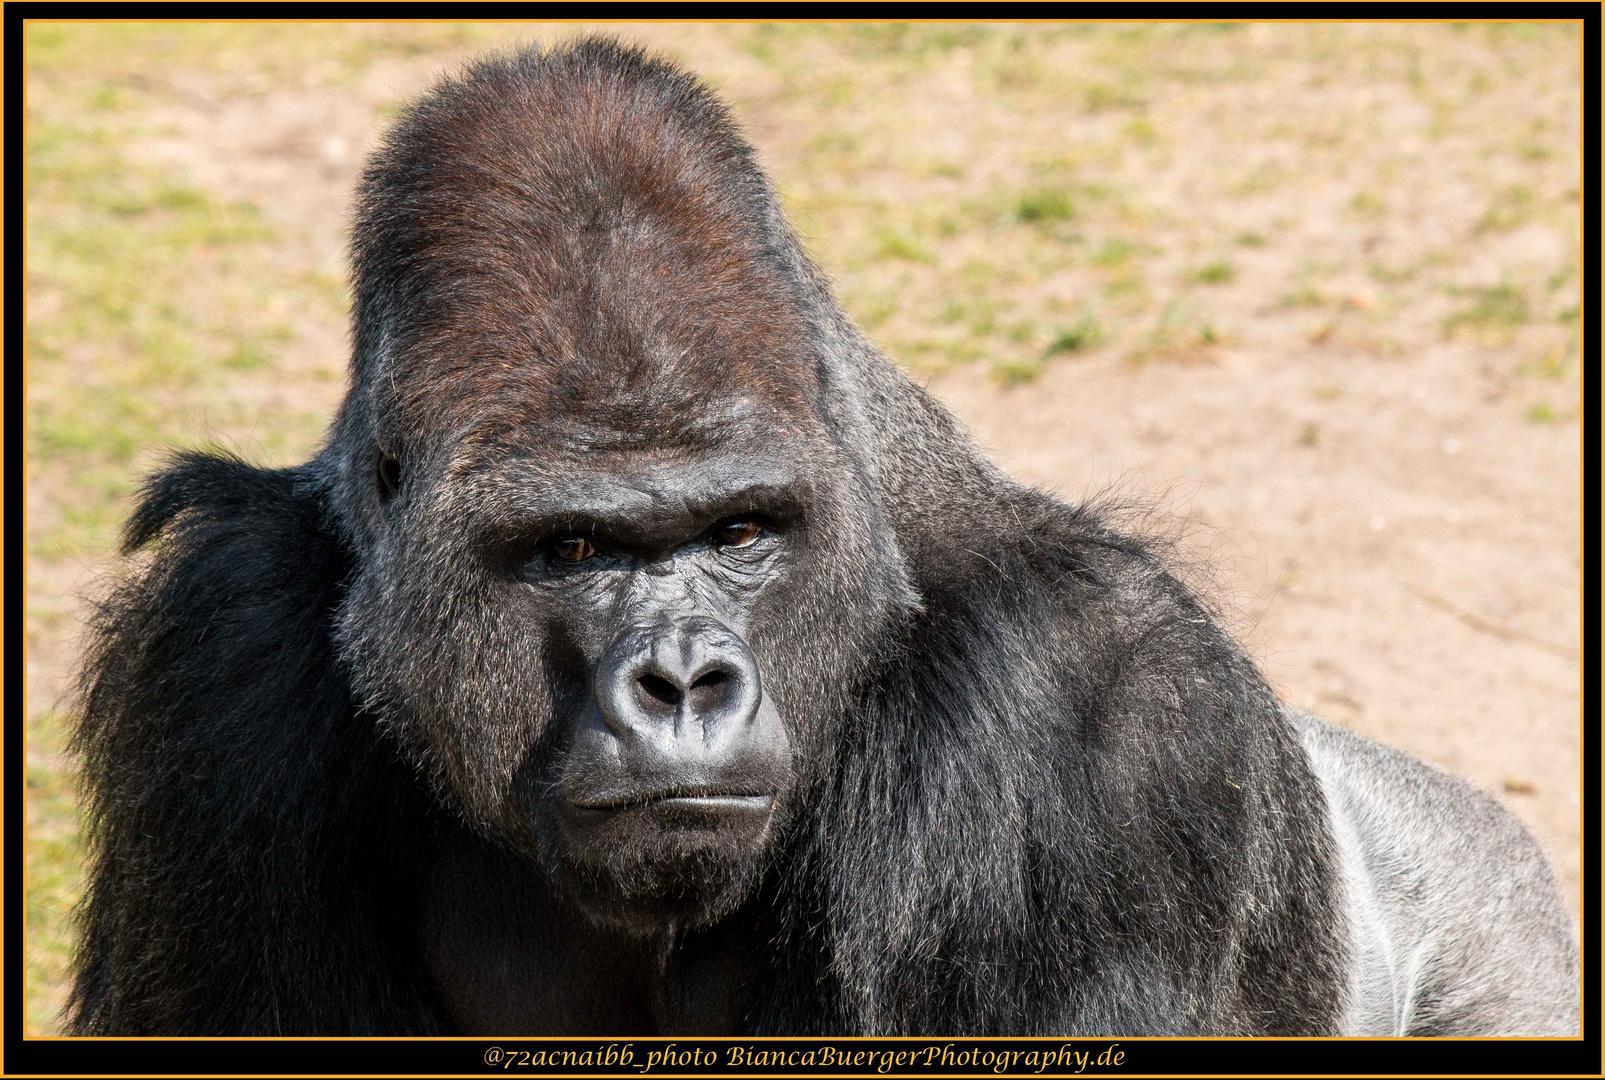 Gorilla Ibo